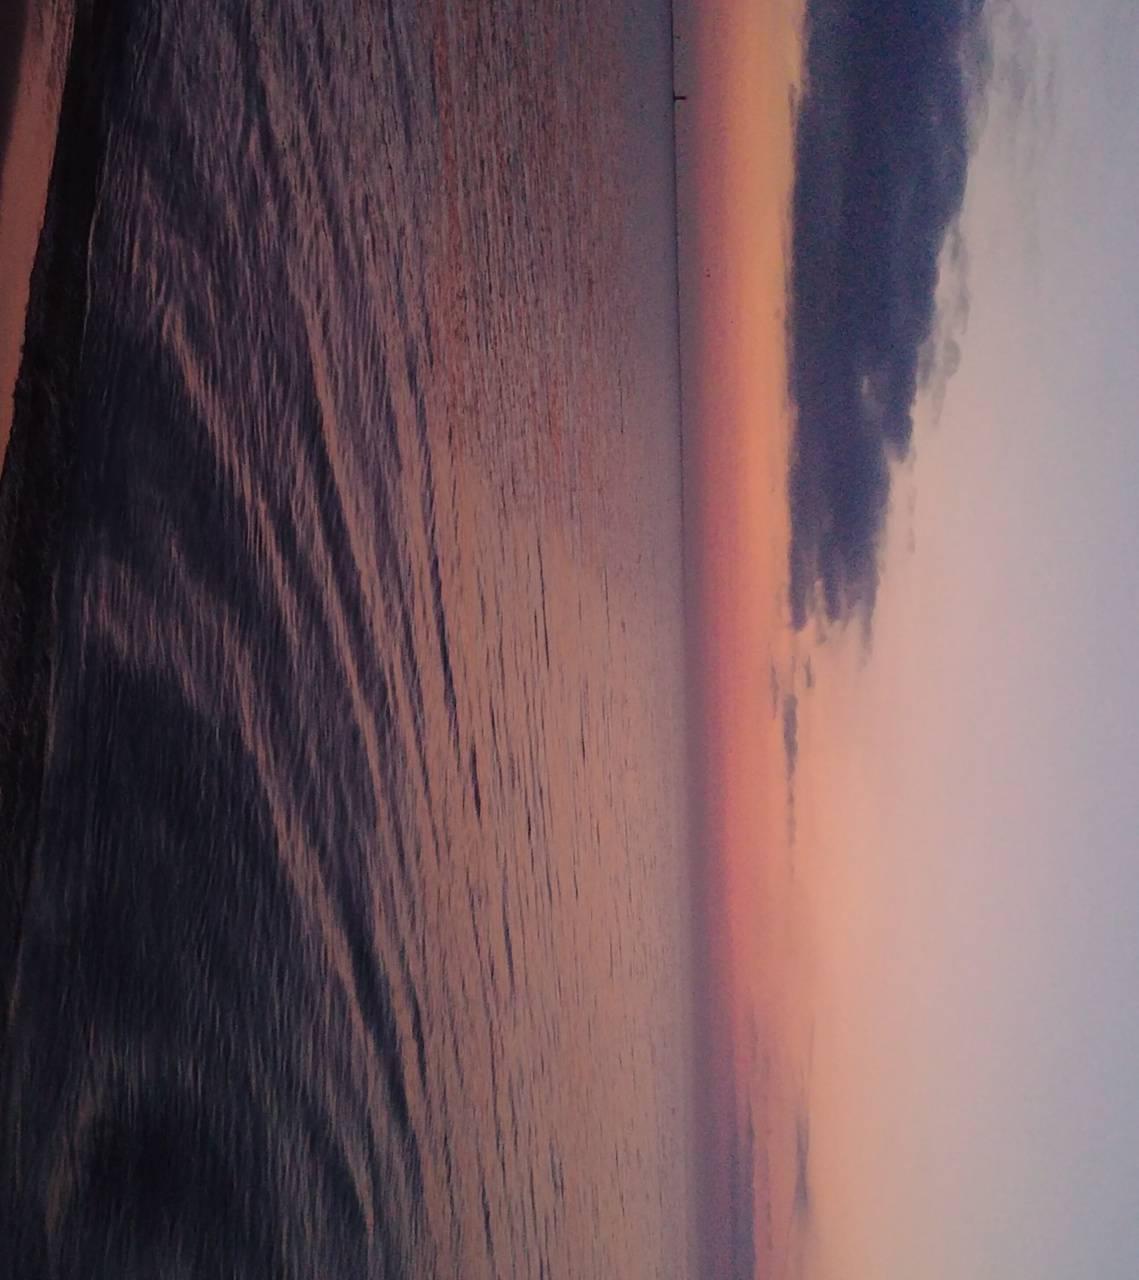 Sunset panarama